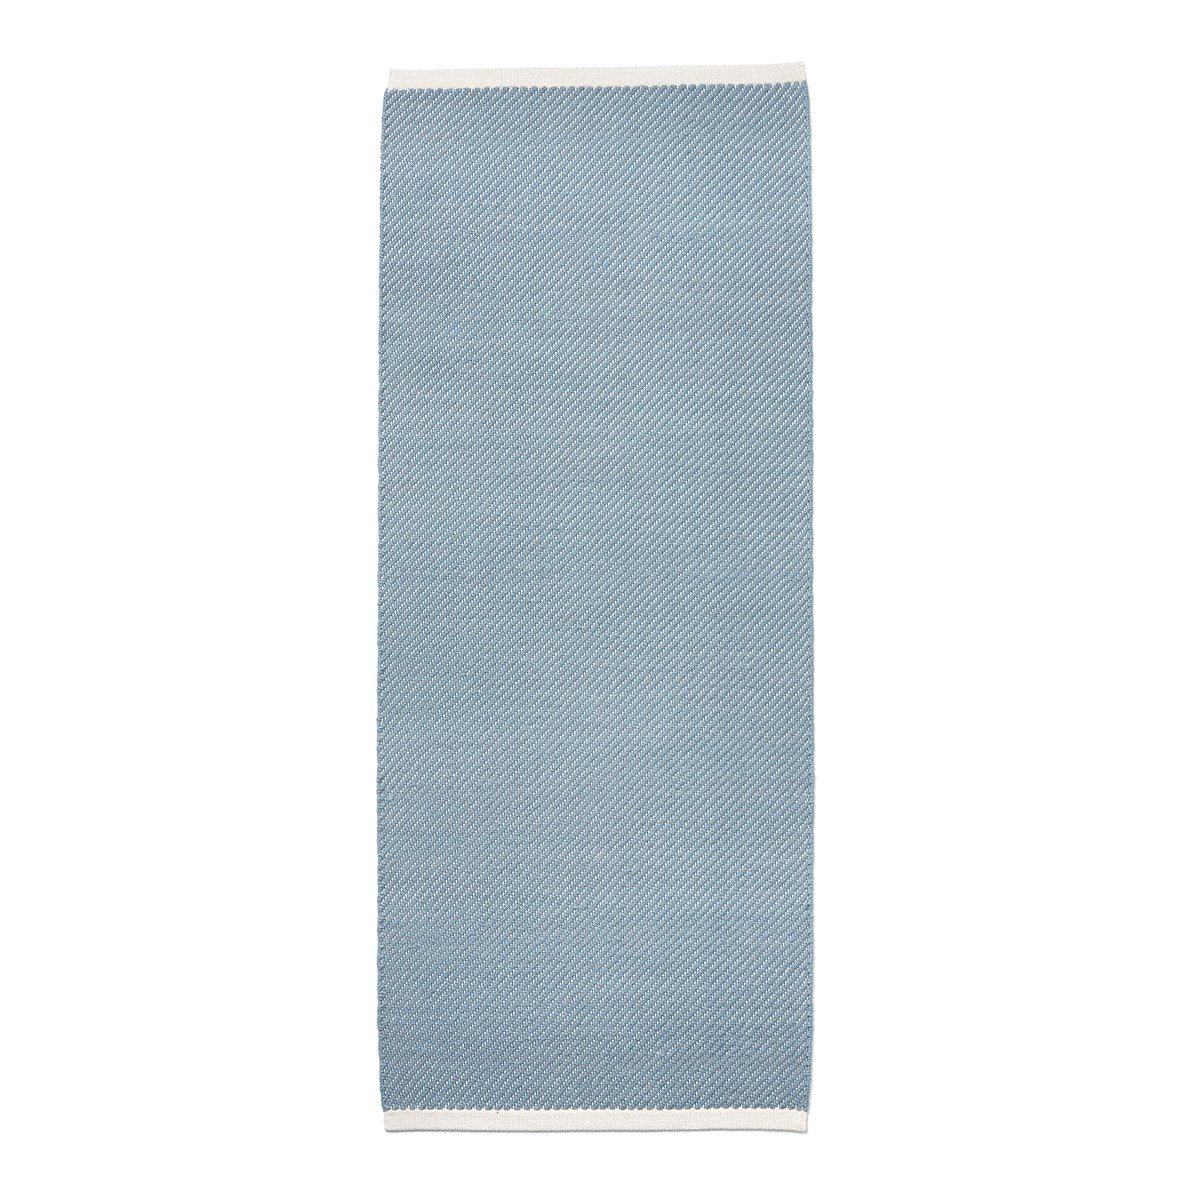 HAY Bias Vloerkleed - Light Blue - 240 x 170 cm.